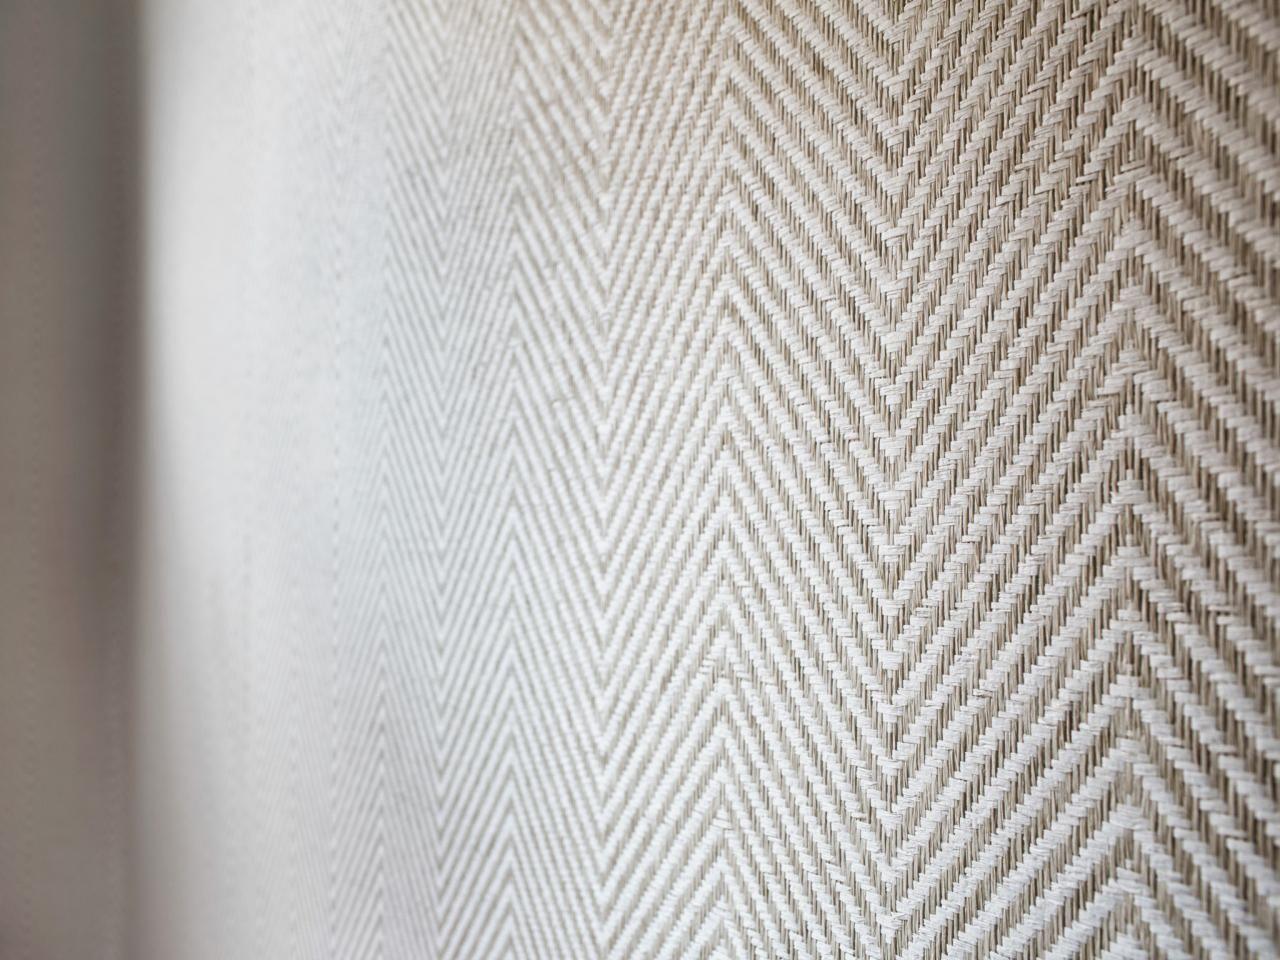 Grass Cloth Wallpaper In Chevron Pattern In Contemporary Nursery Grasscloth Wallpaper Grasscloth Wallpaper Bedroom Contemporary Nursery